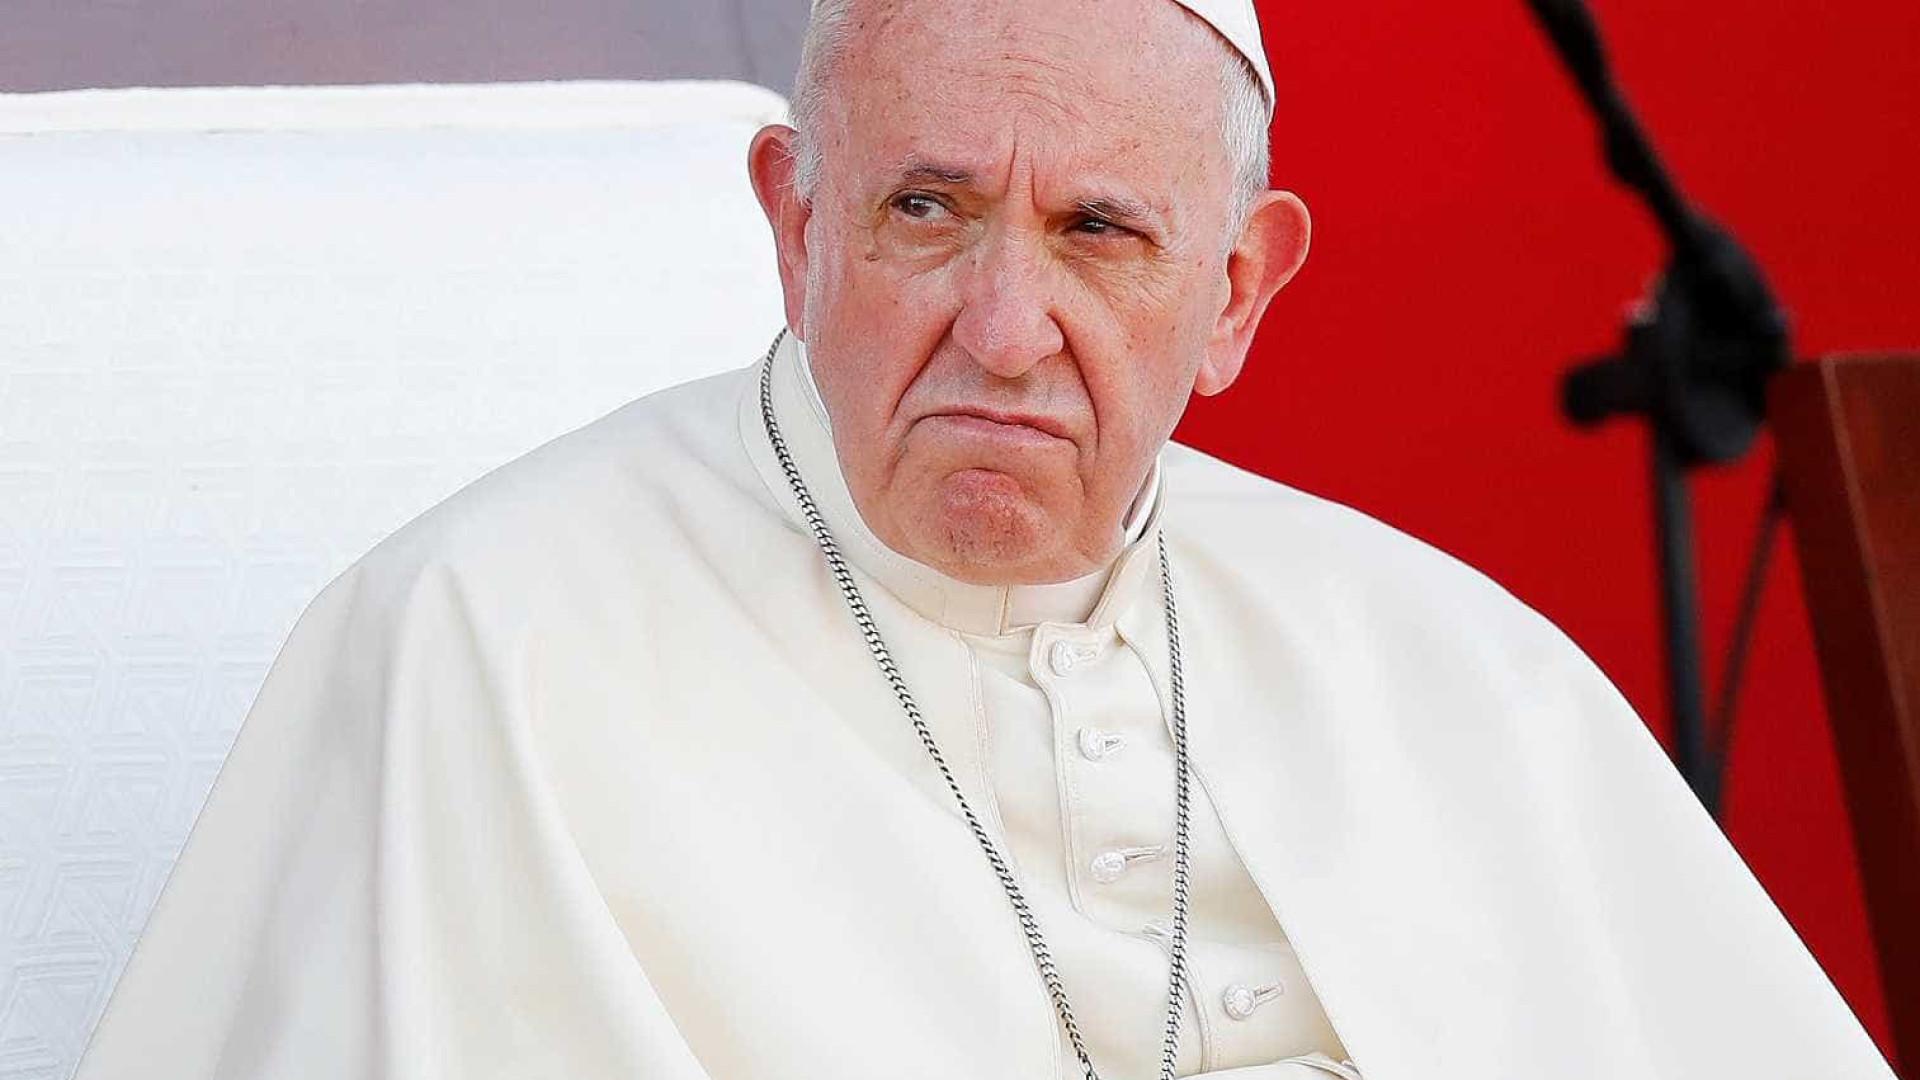 Vítimas de abusos farão protesto durante cúpula do Papa